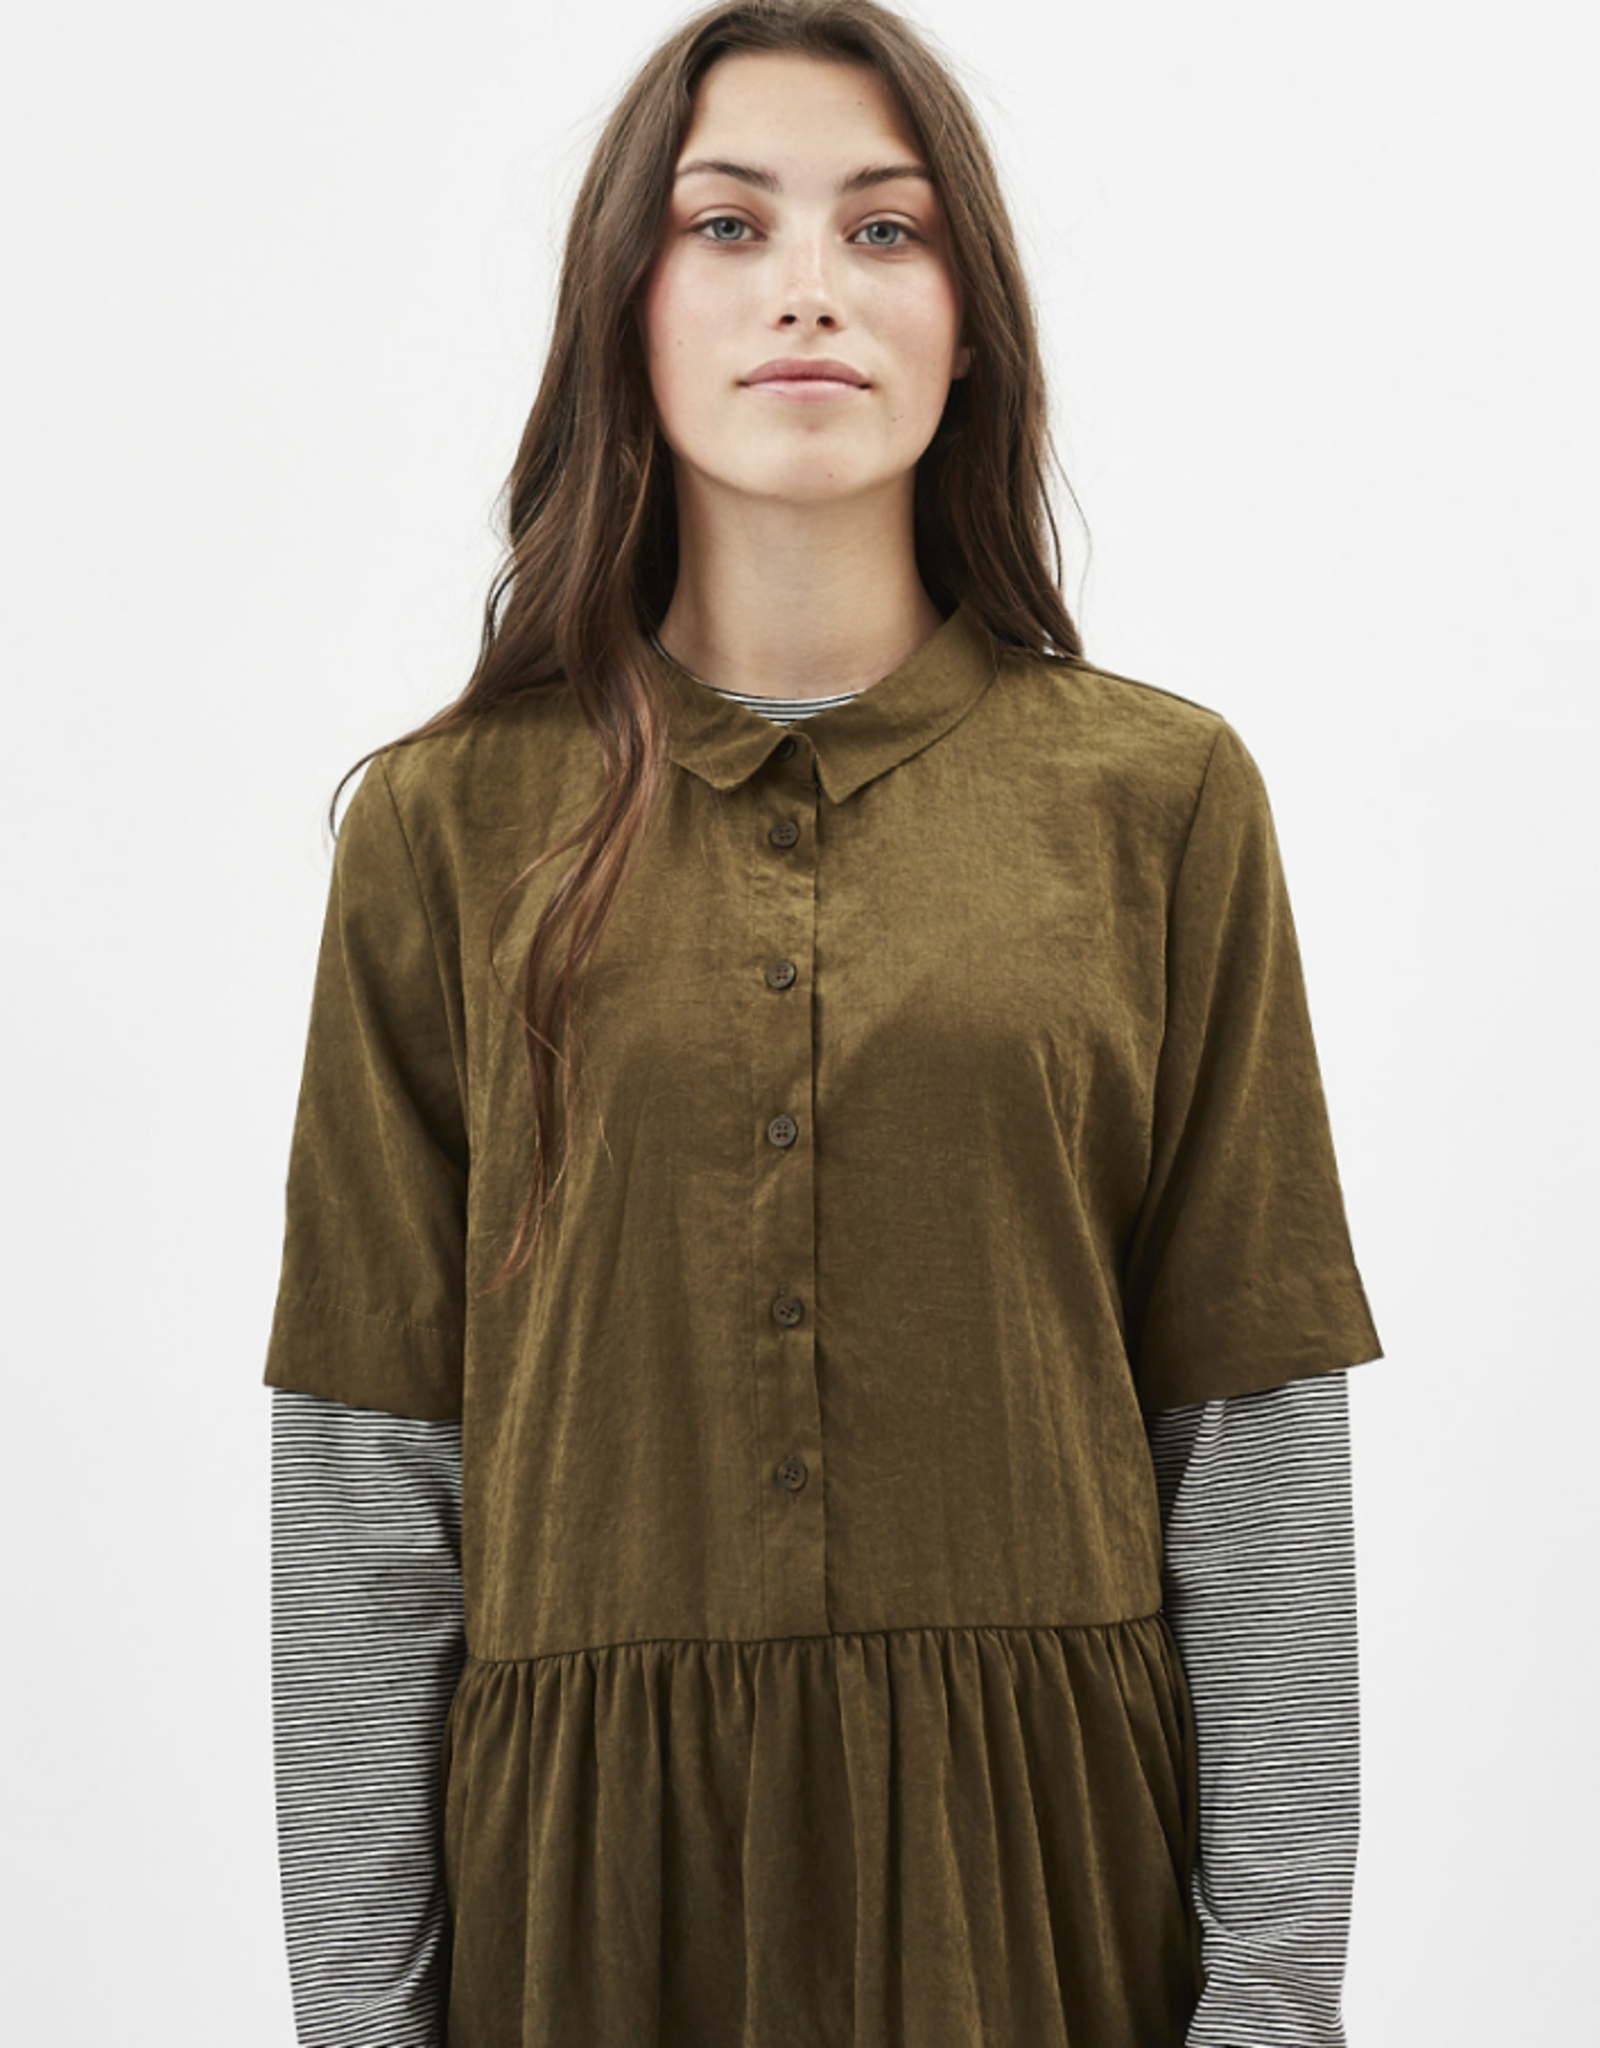 Minimum Bindie Dress